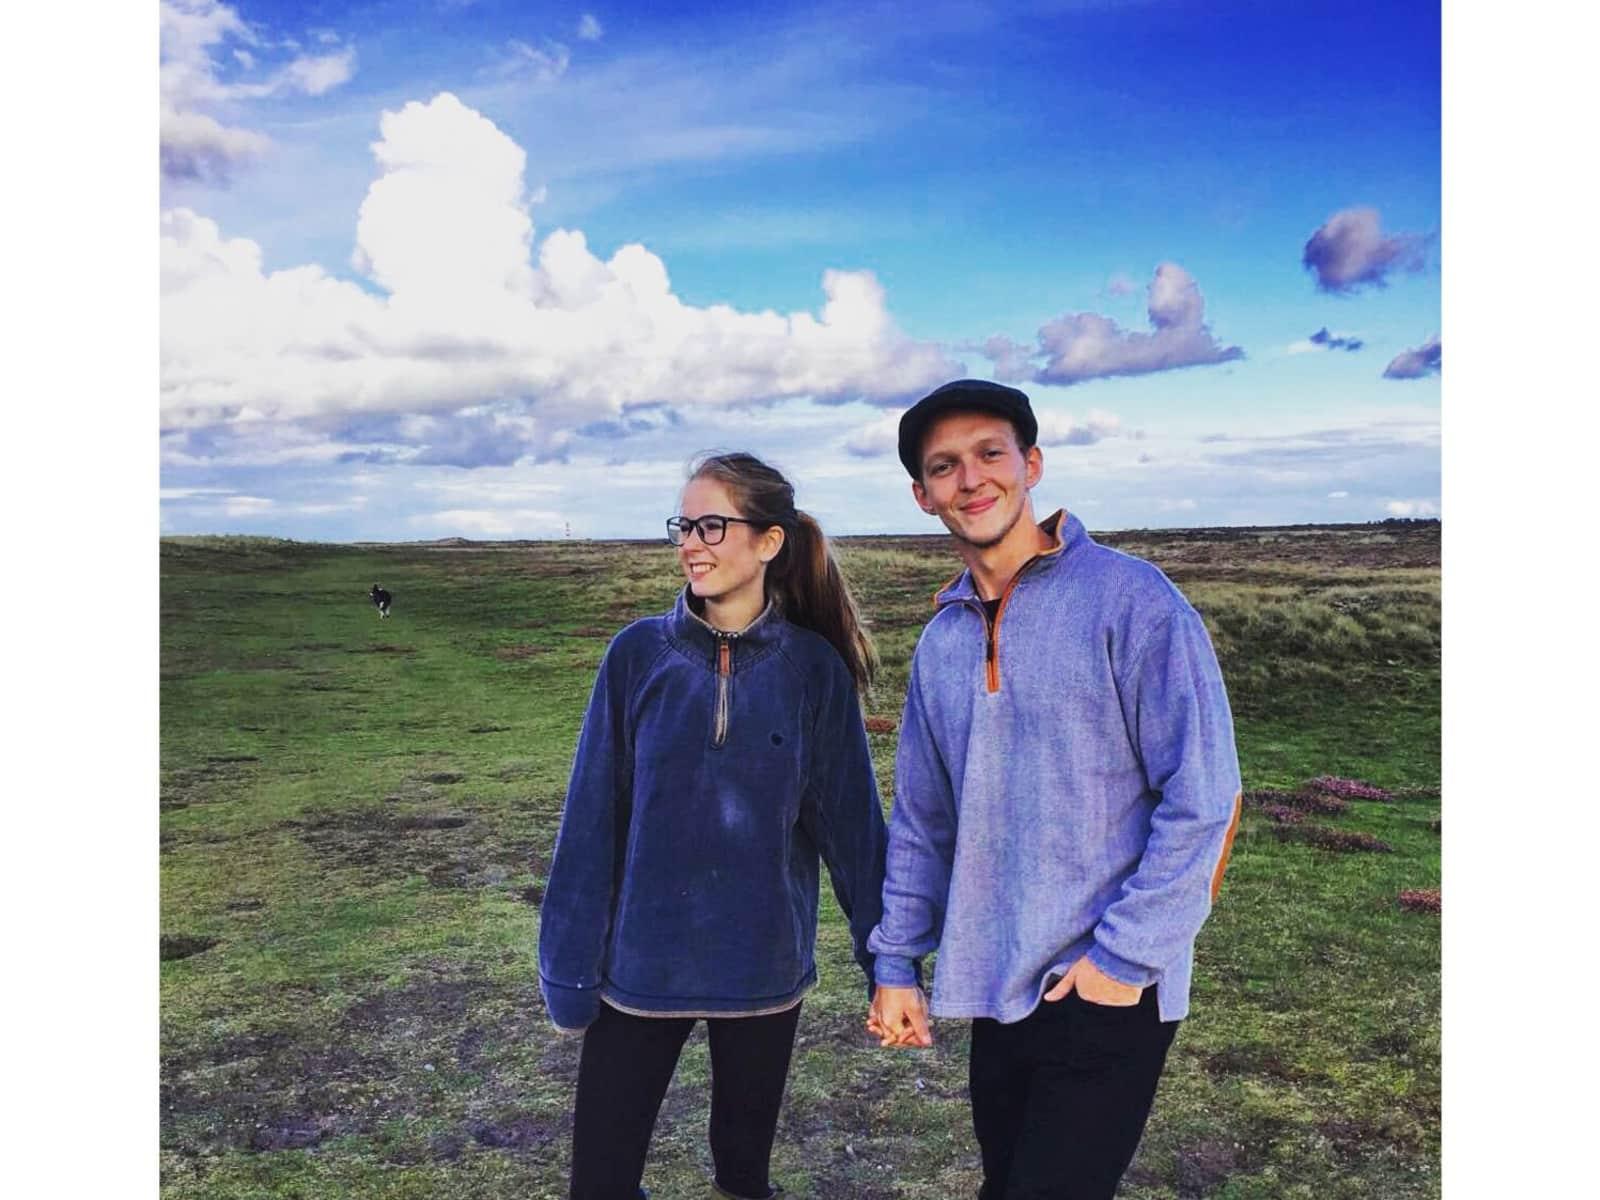 Peter & Lucinda from Bristol, United Kingdom